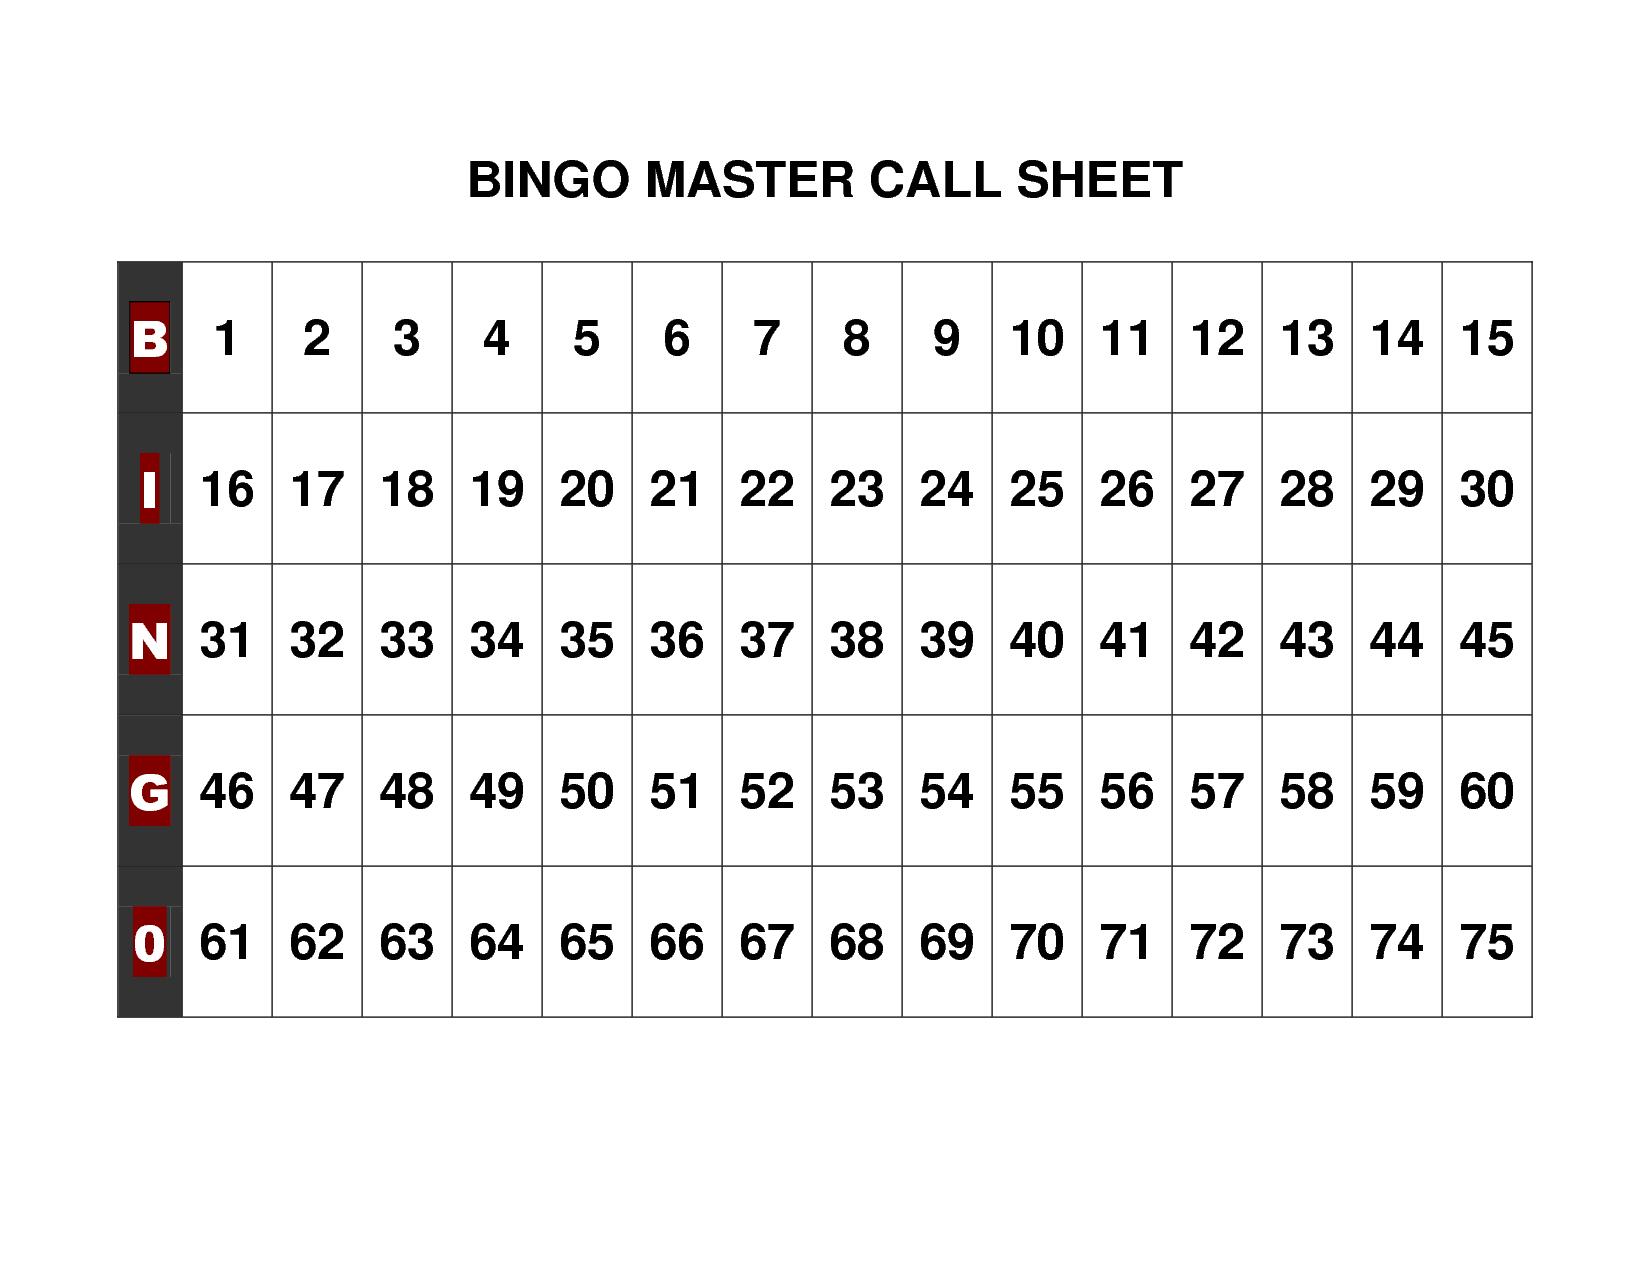 Free+Printable+Bingo+Call+Sheet | Bingo | Bingo Calls, Bingo, Free - Free Printable Bingo Cards 1 75